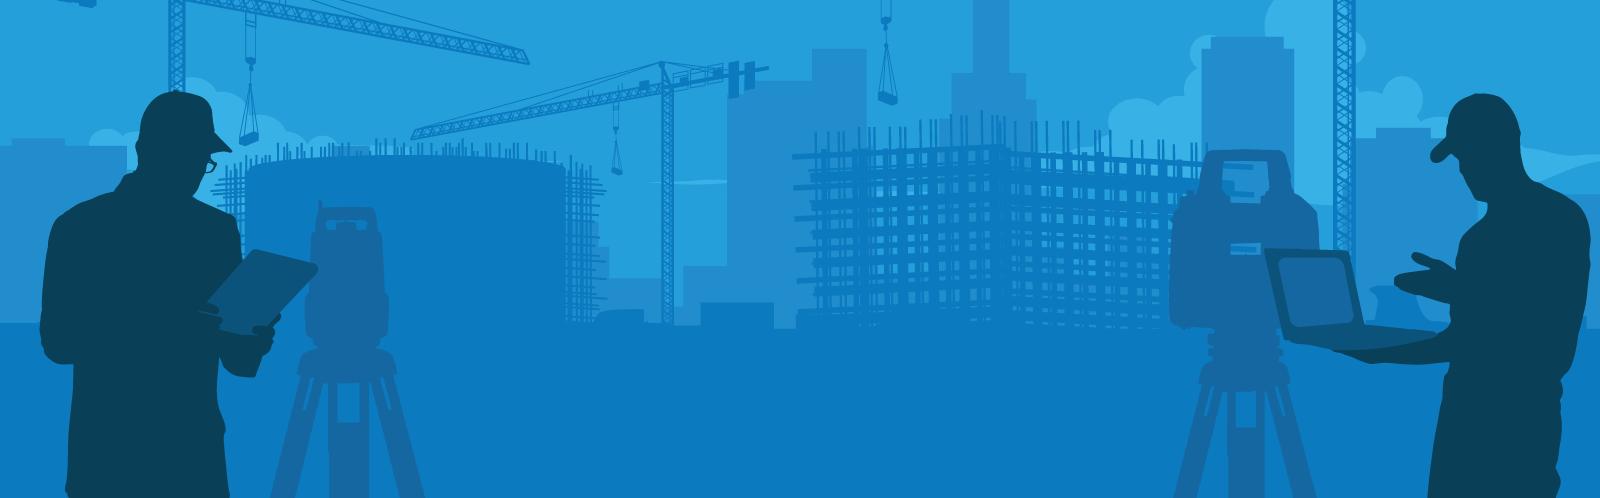 Building Information Modeling BIM (construction graphics)